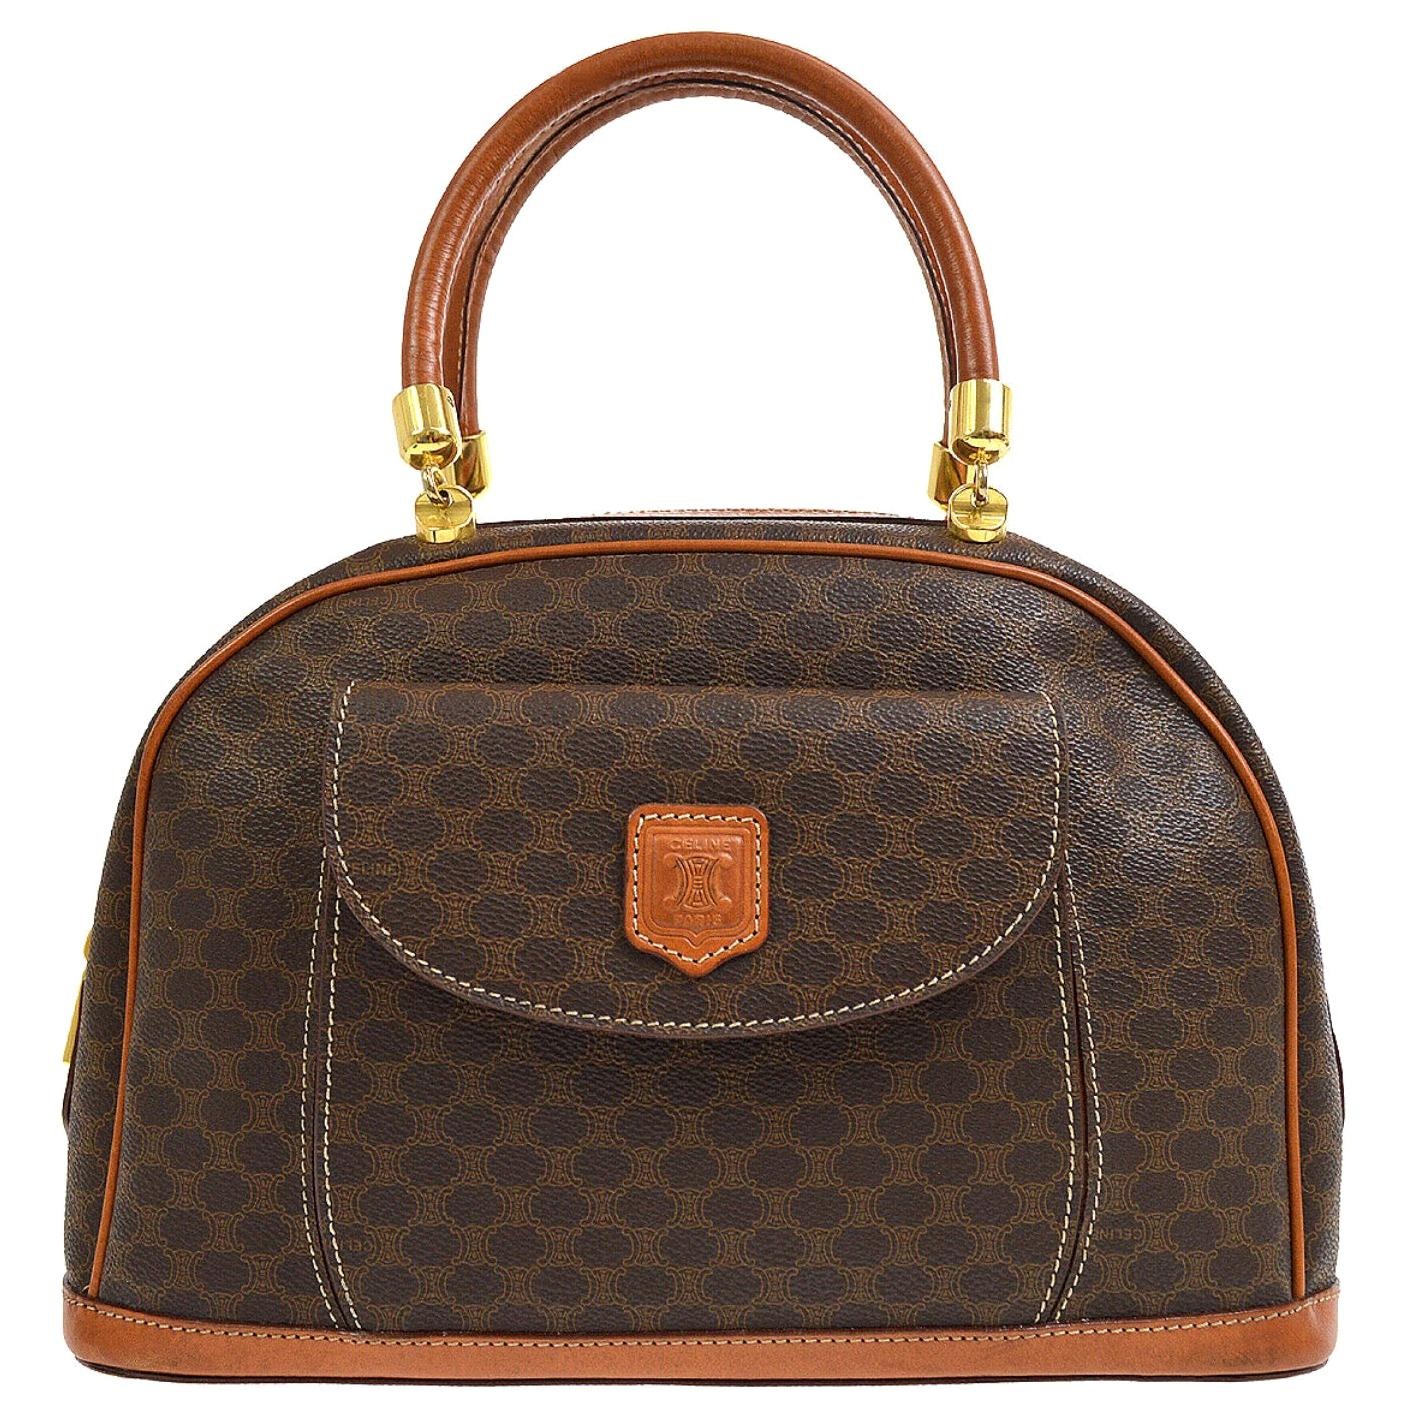 Celine Monogram Cognac Gold Top Handle Satchel Tote Bag